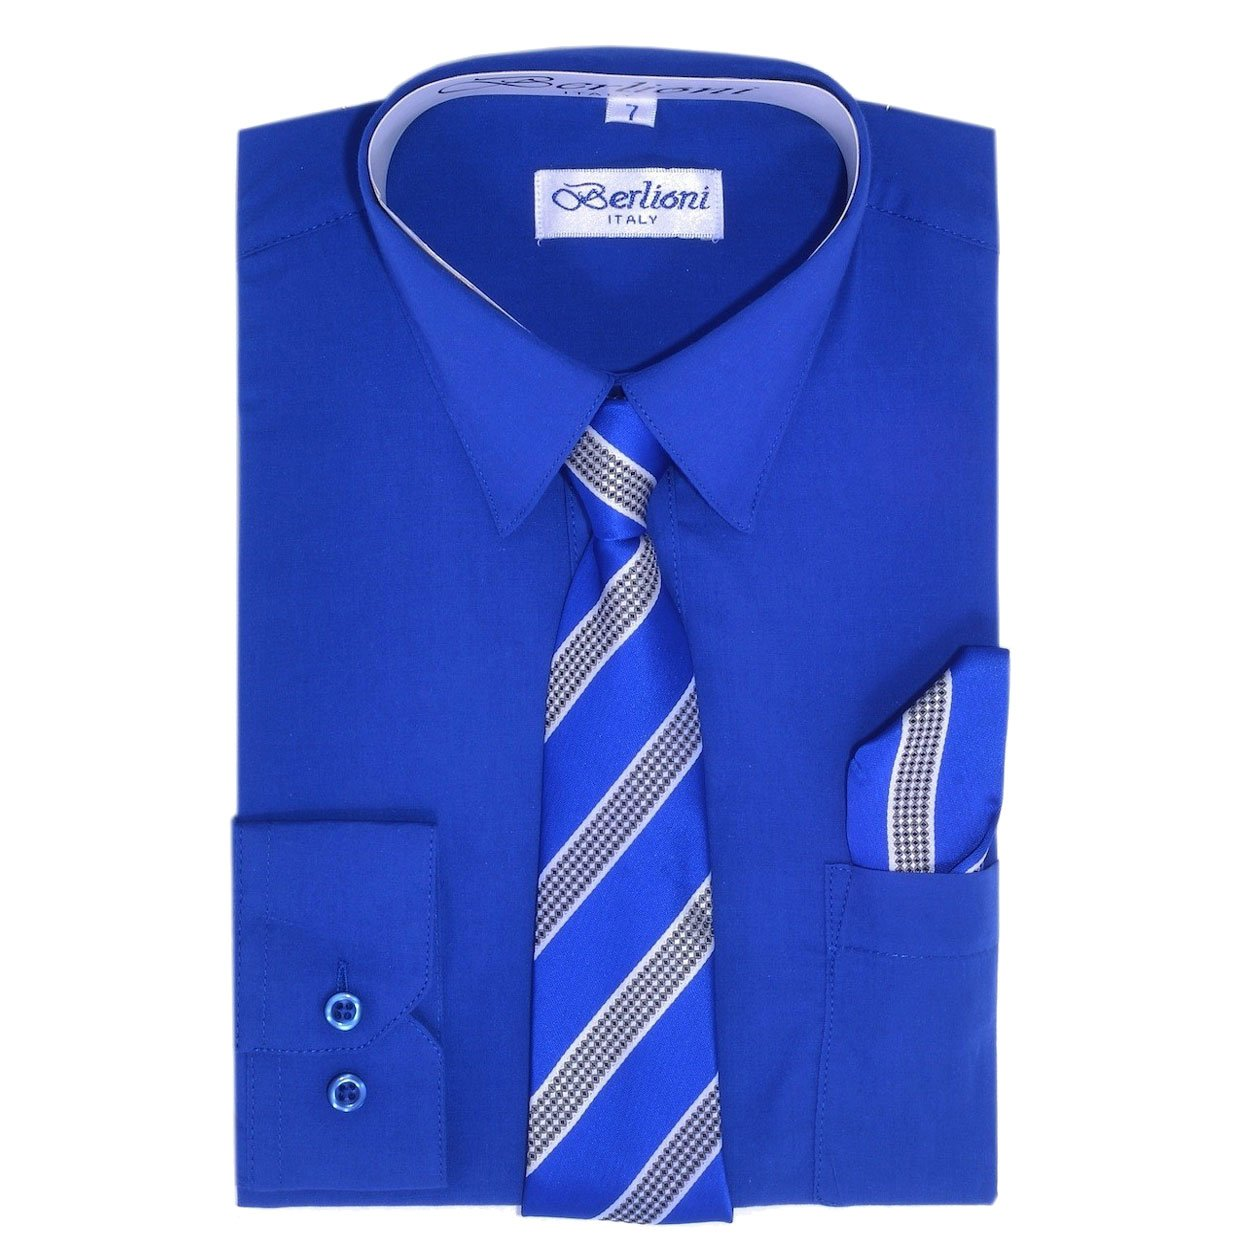 Royal Boys Fashion Solid Dress Shirt Tie and Hanky Set